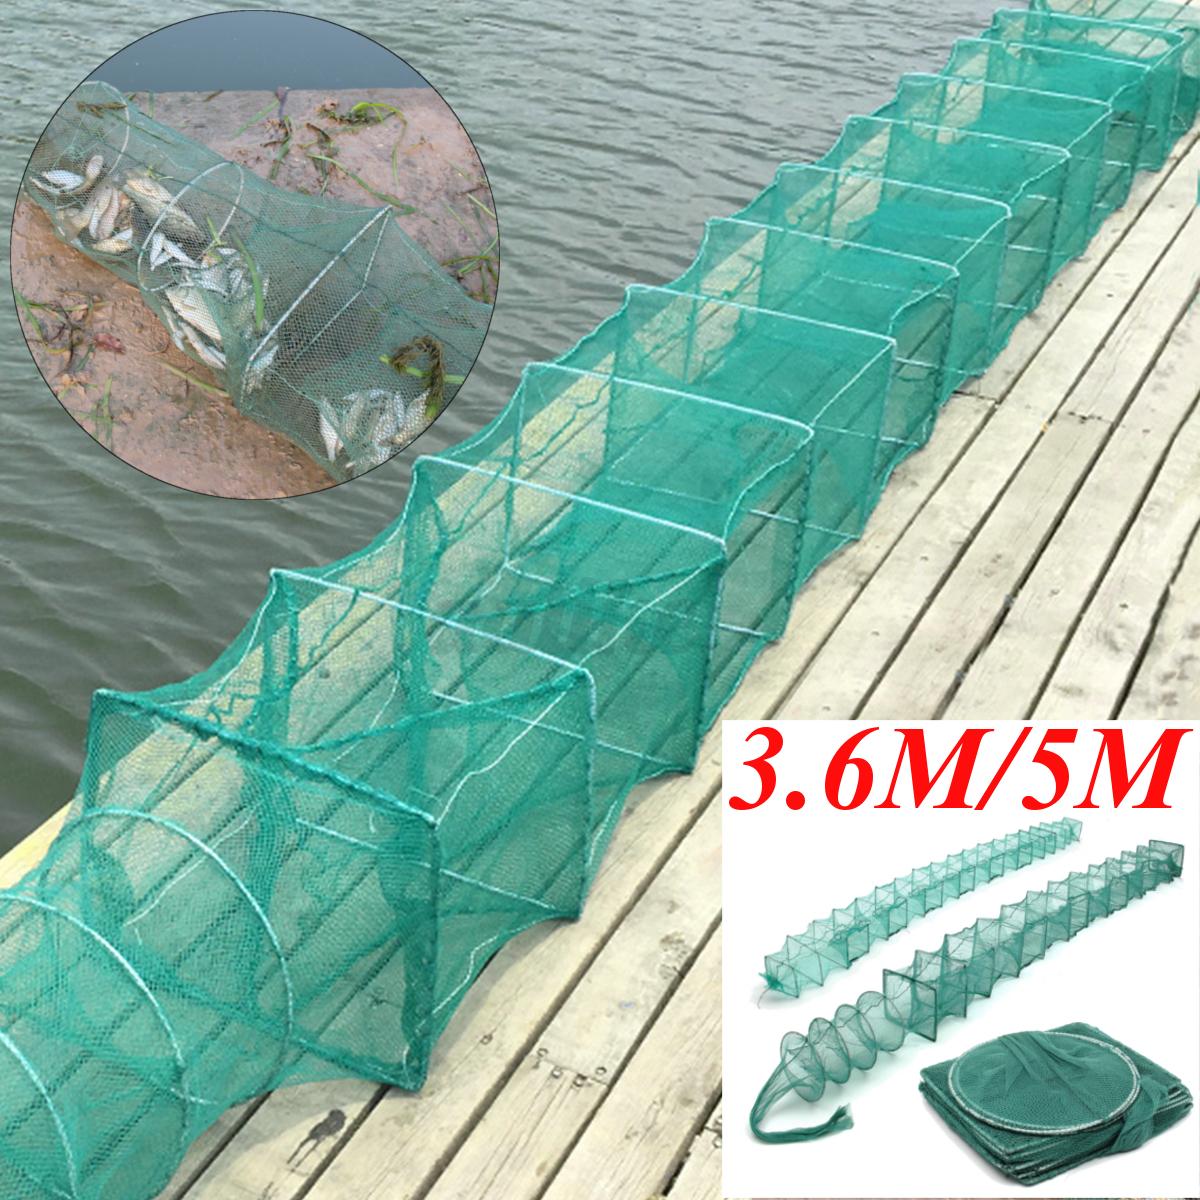 3.6M//5M Crab Crayfish Lobster Catcher Live Trap Fish Net Eel Prawn Shrimp Bait